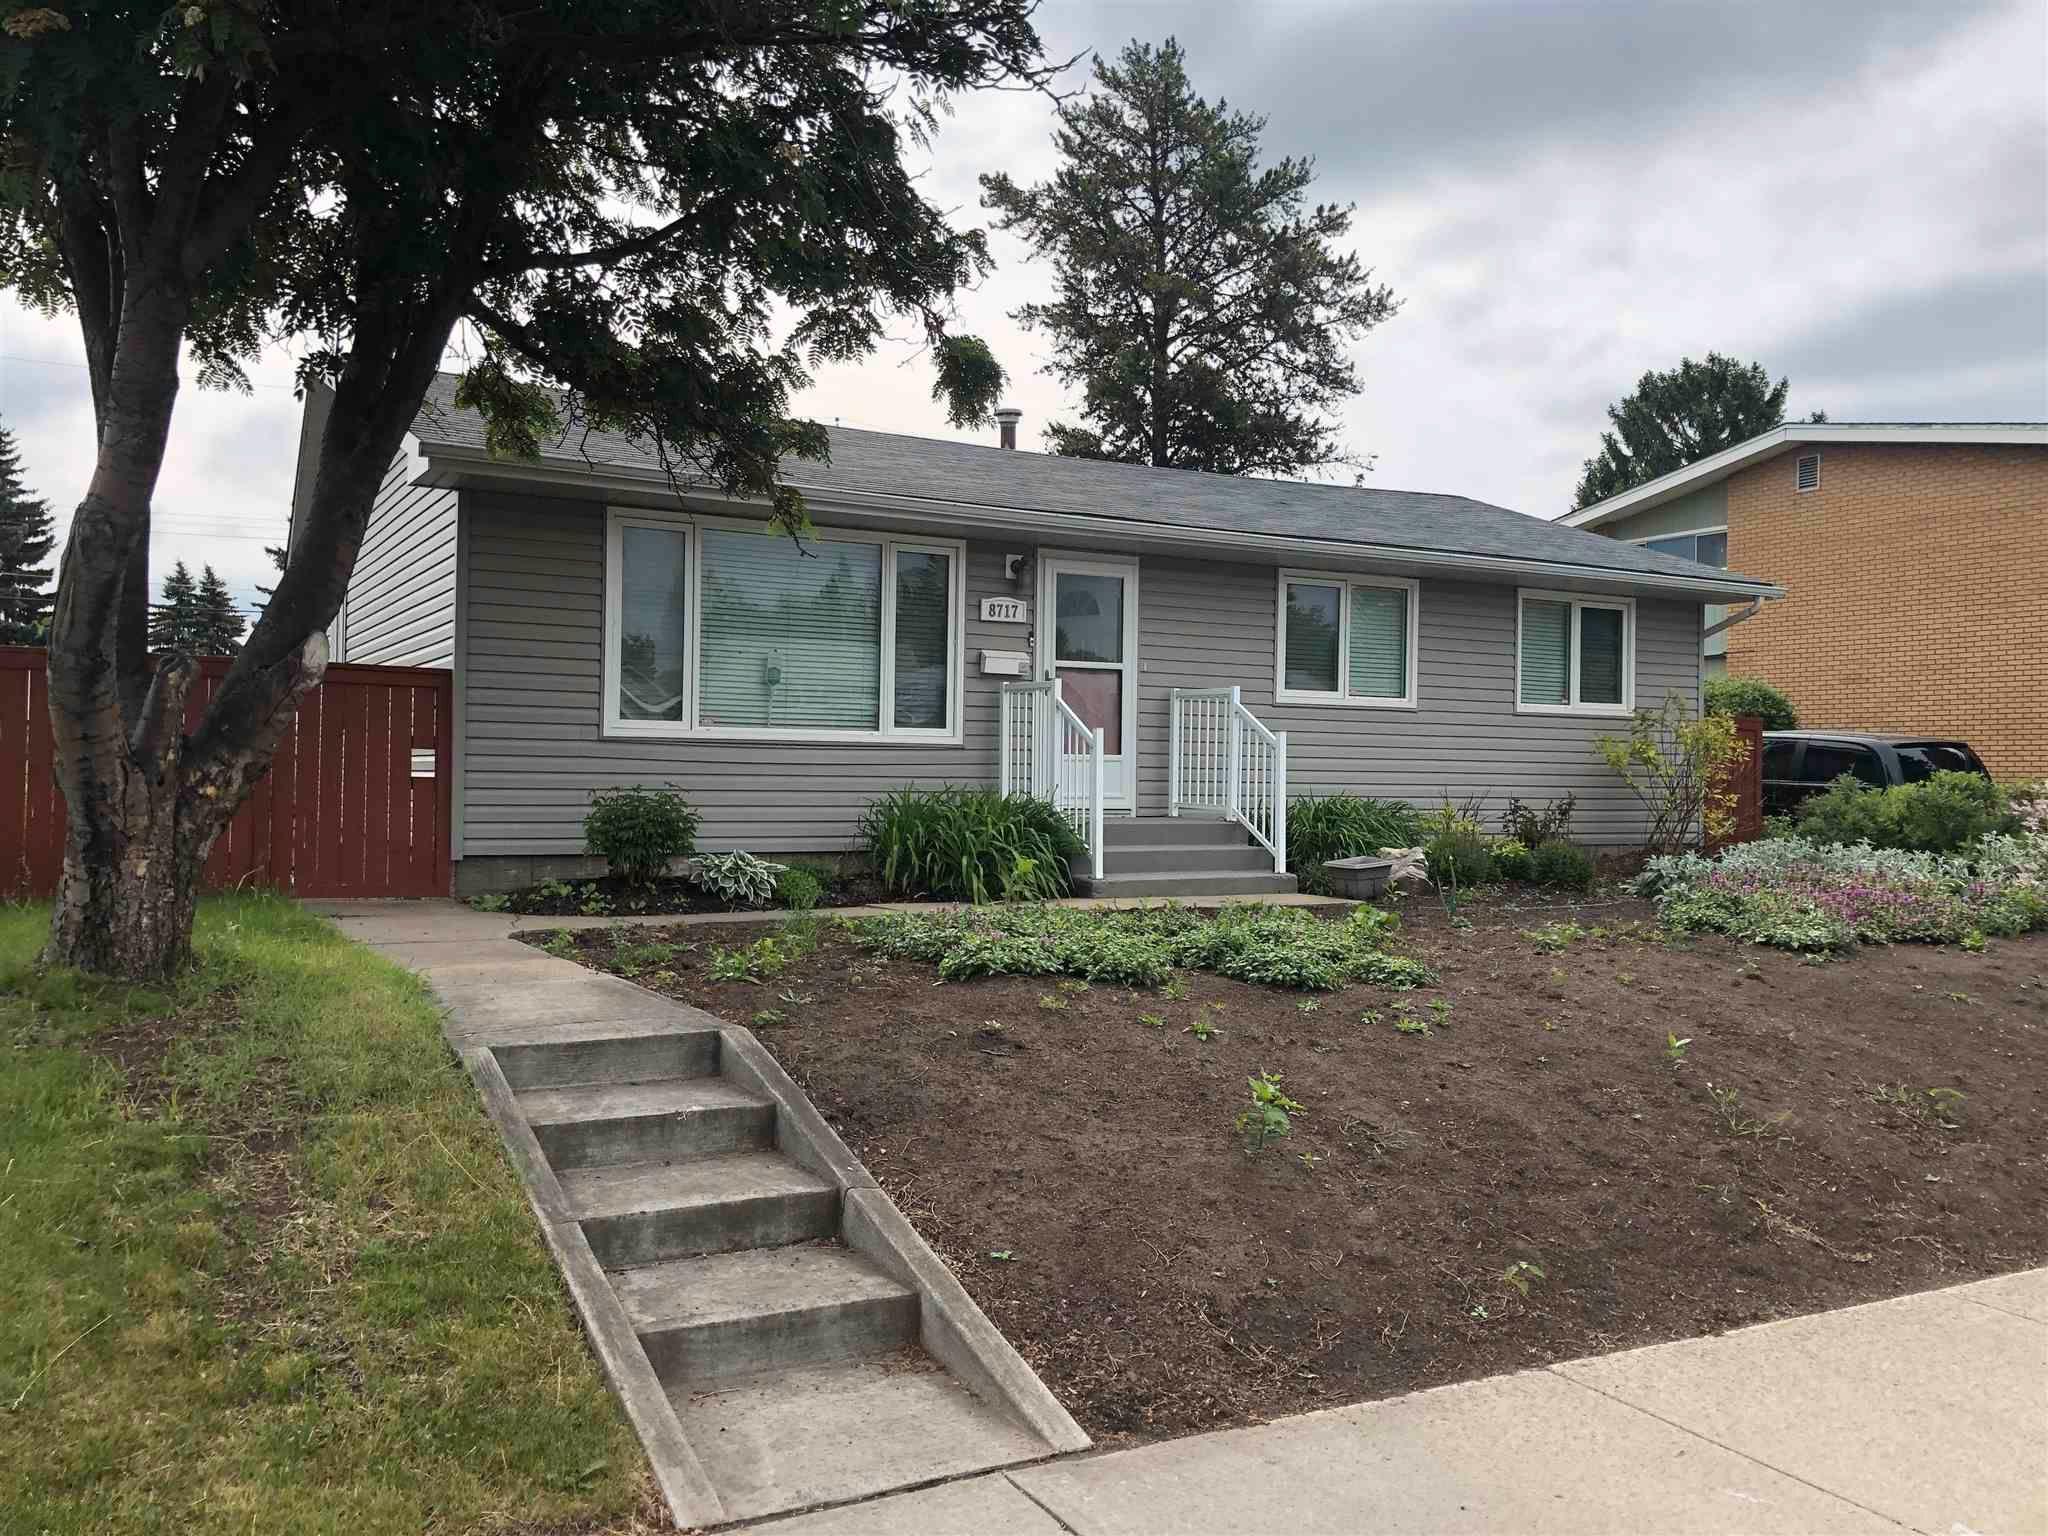 Main Photo: 8717 163 Street in Edmonton: Zone 22 House for sale : MLS®# E4249833